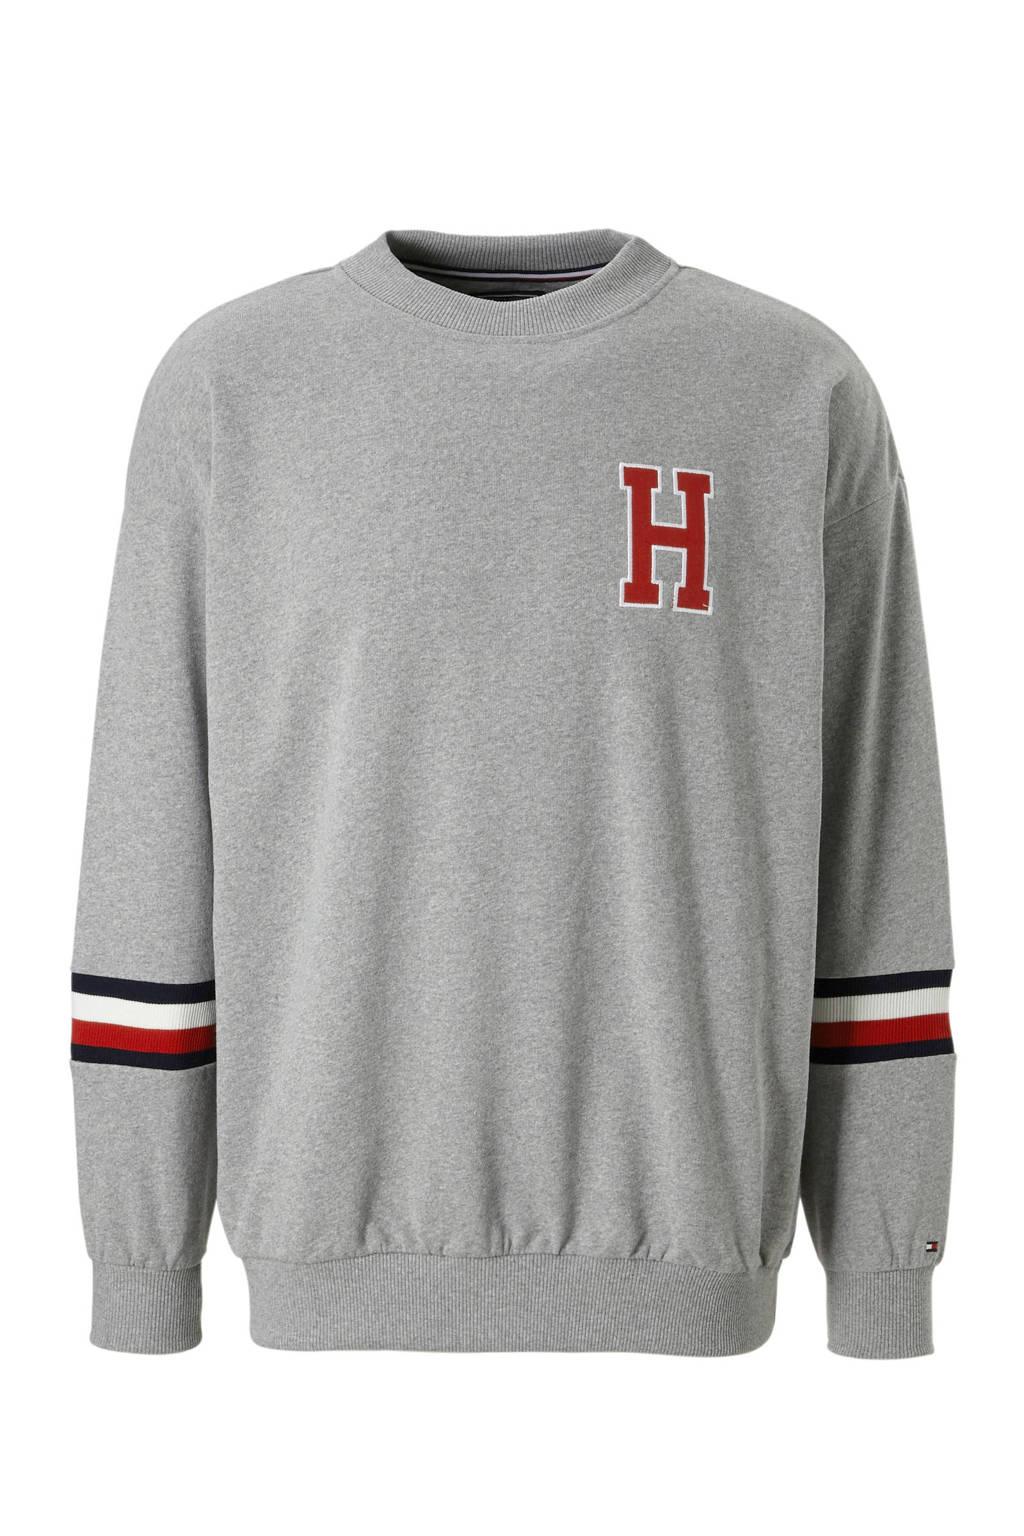 Tommy Hilfiger sweater grijs mêlee, grijs mêlee